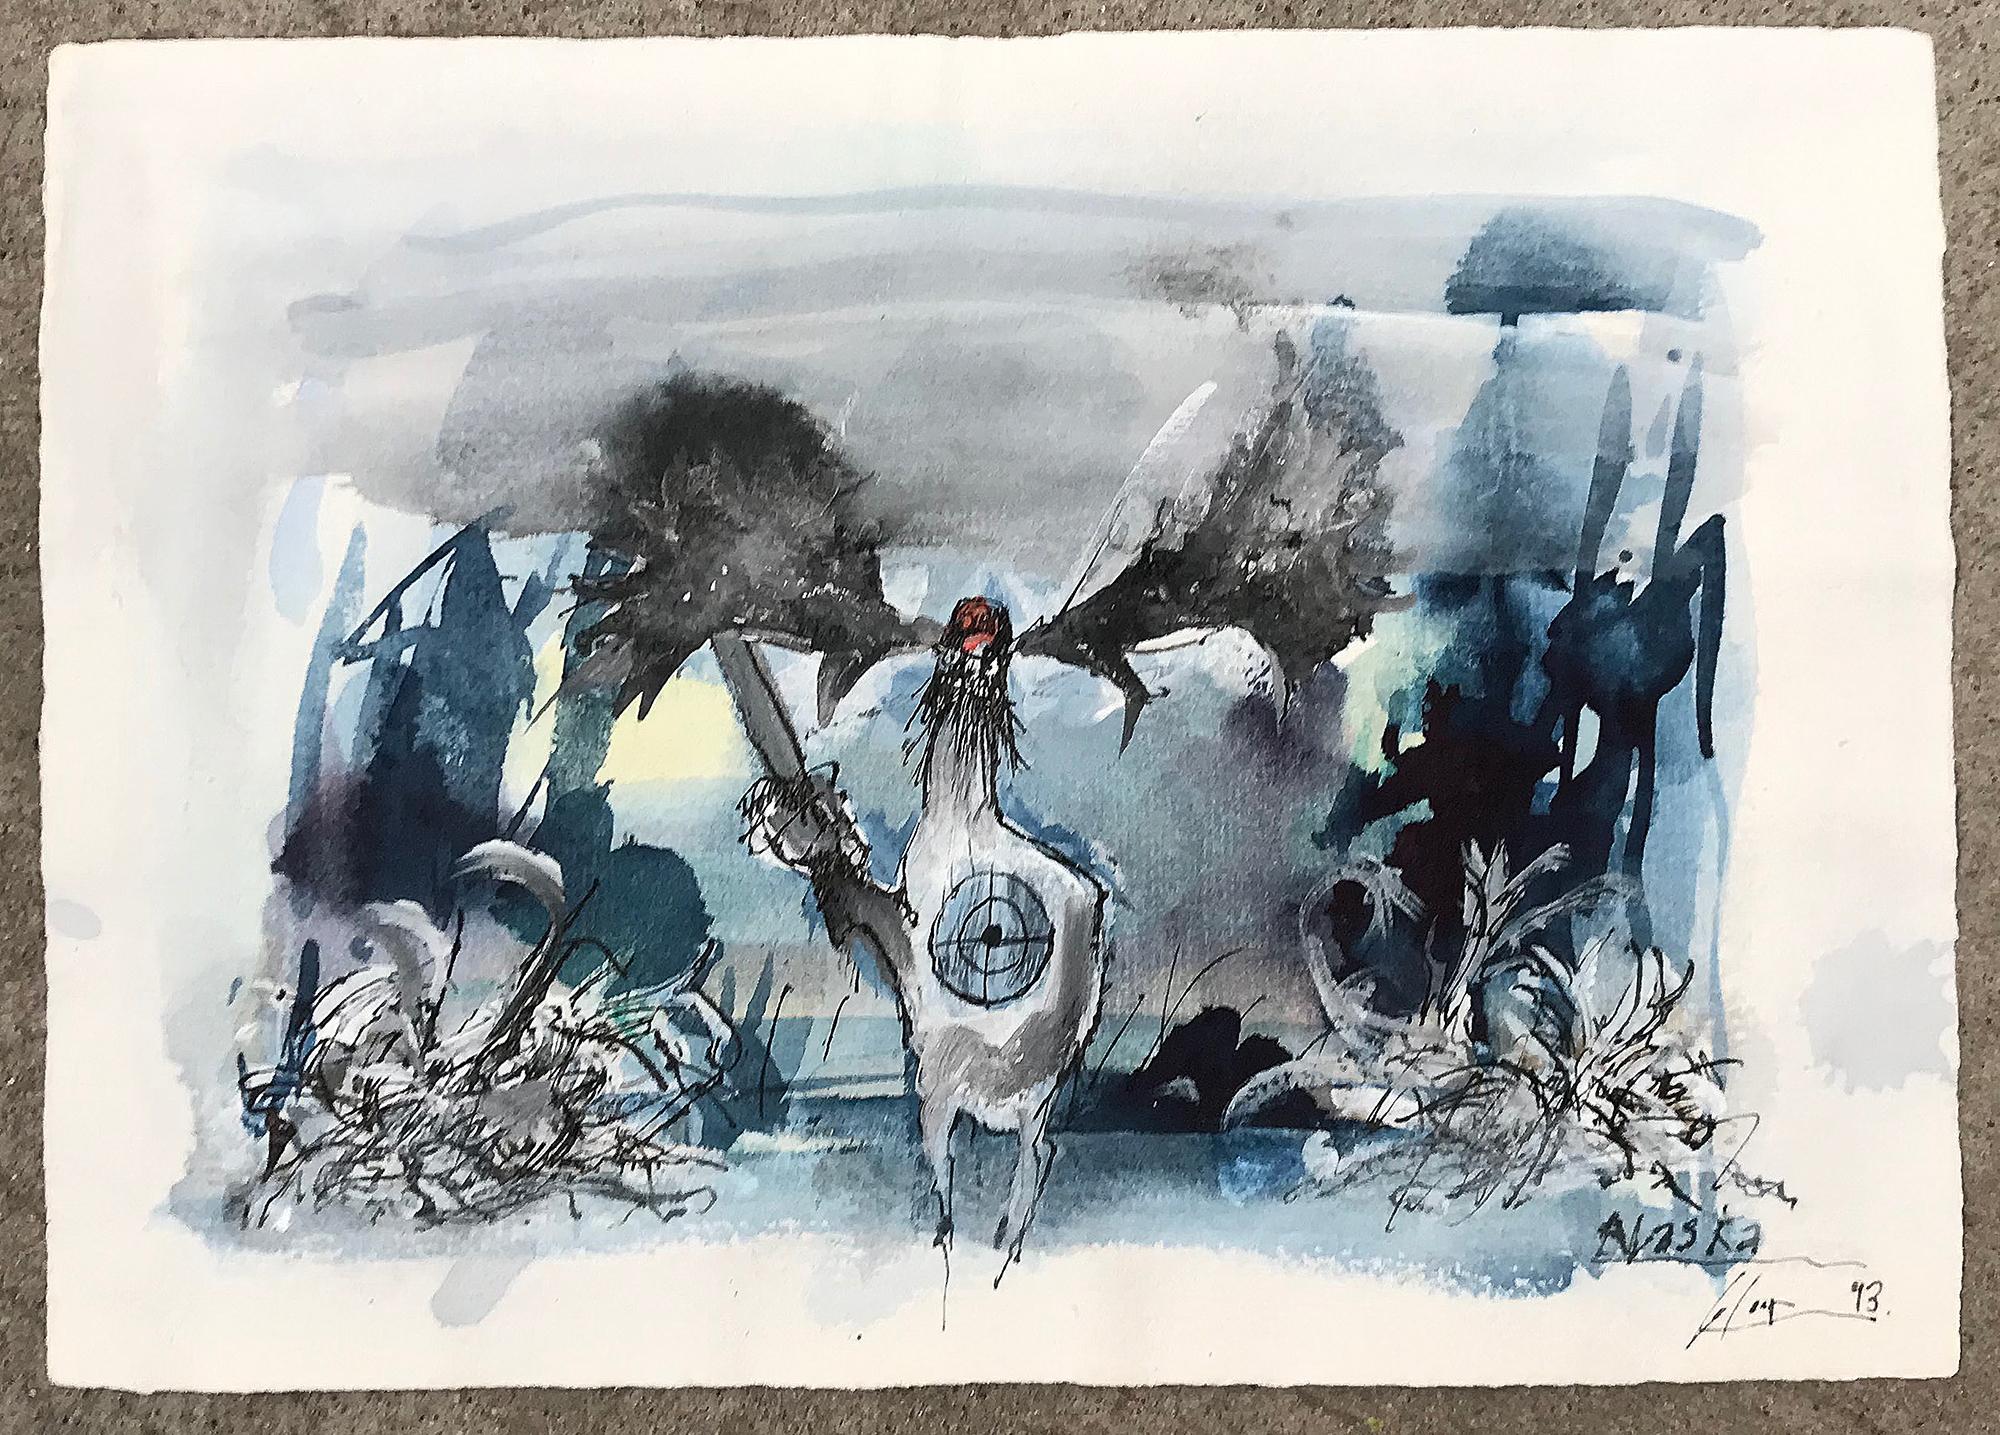 Alaska, 1993, Mischtechnik auf Büttenpapier, 28 x 21 cm, ohne Rahmen